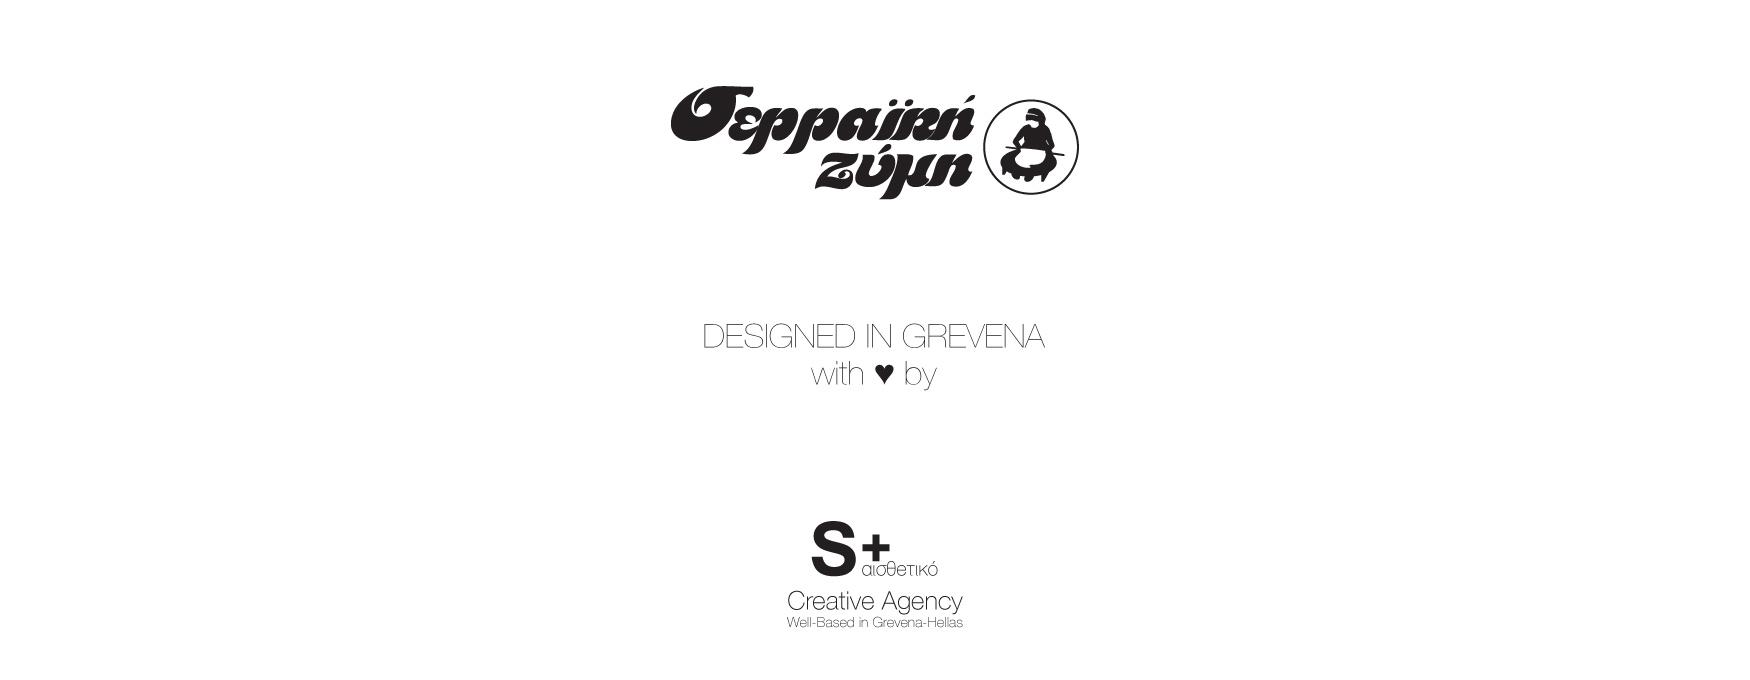 seraiki_zimi_designed